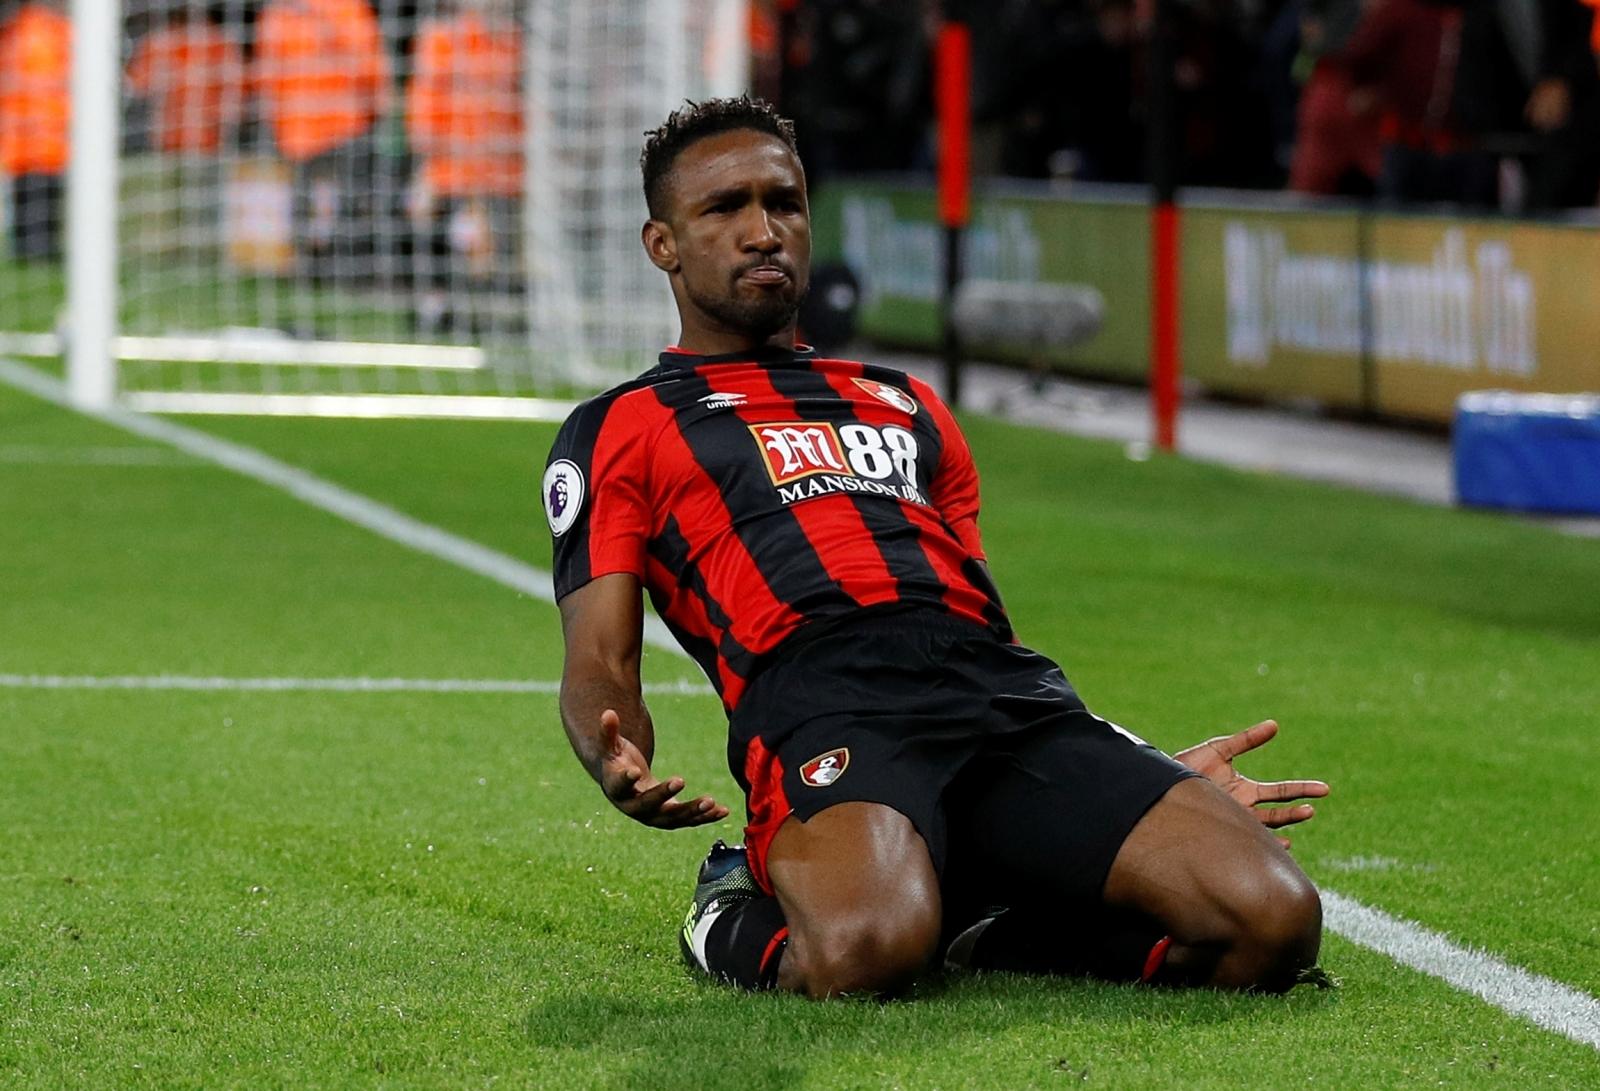 Bournemouth's Joshua King pleased to open goalscoring account